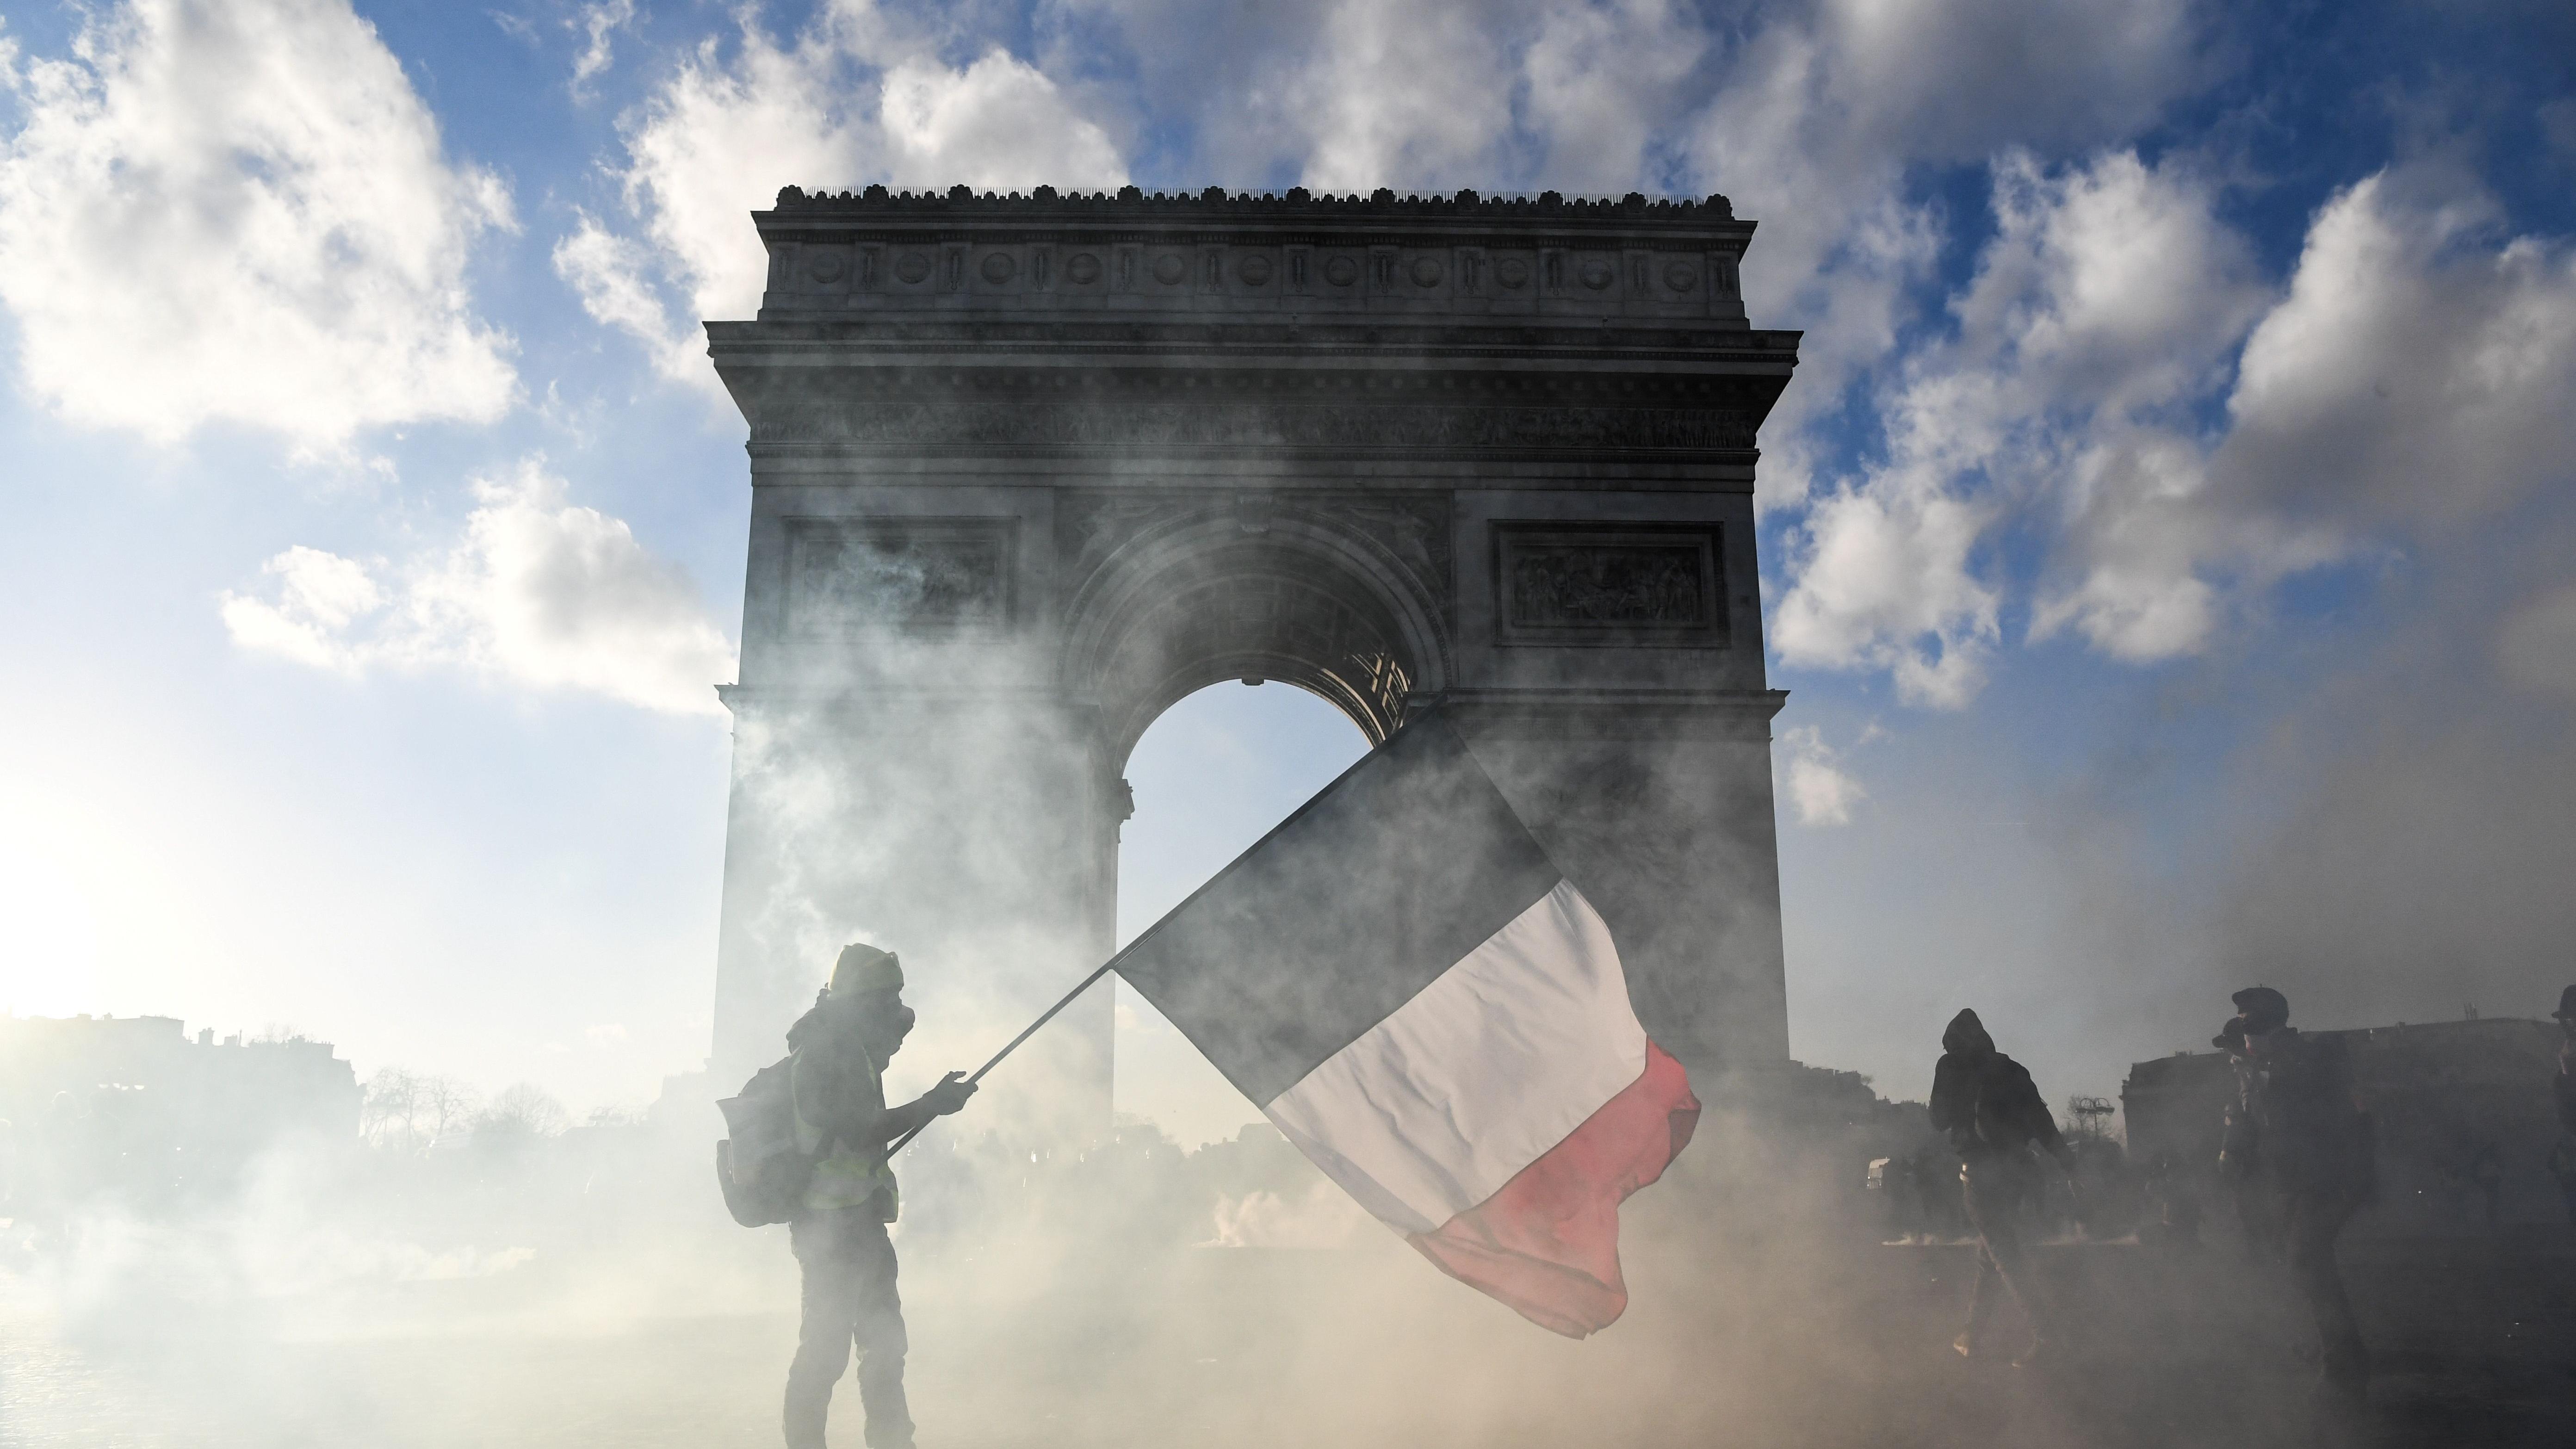 Paris verbietet Gelbwesten-Proteste an bestimmten Orten